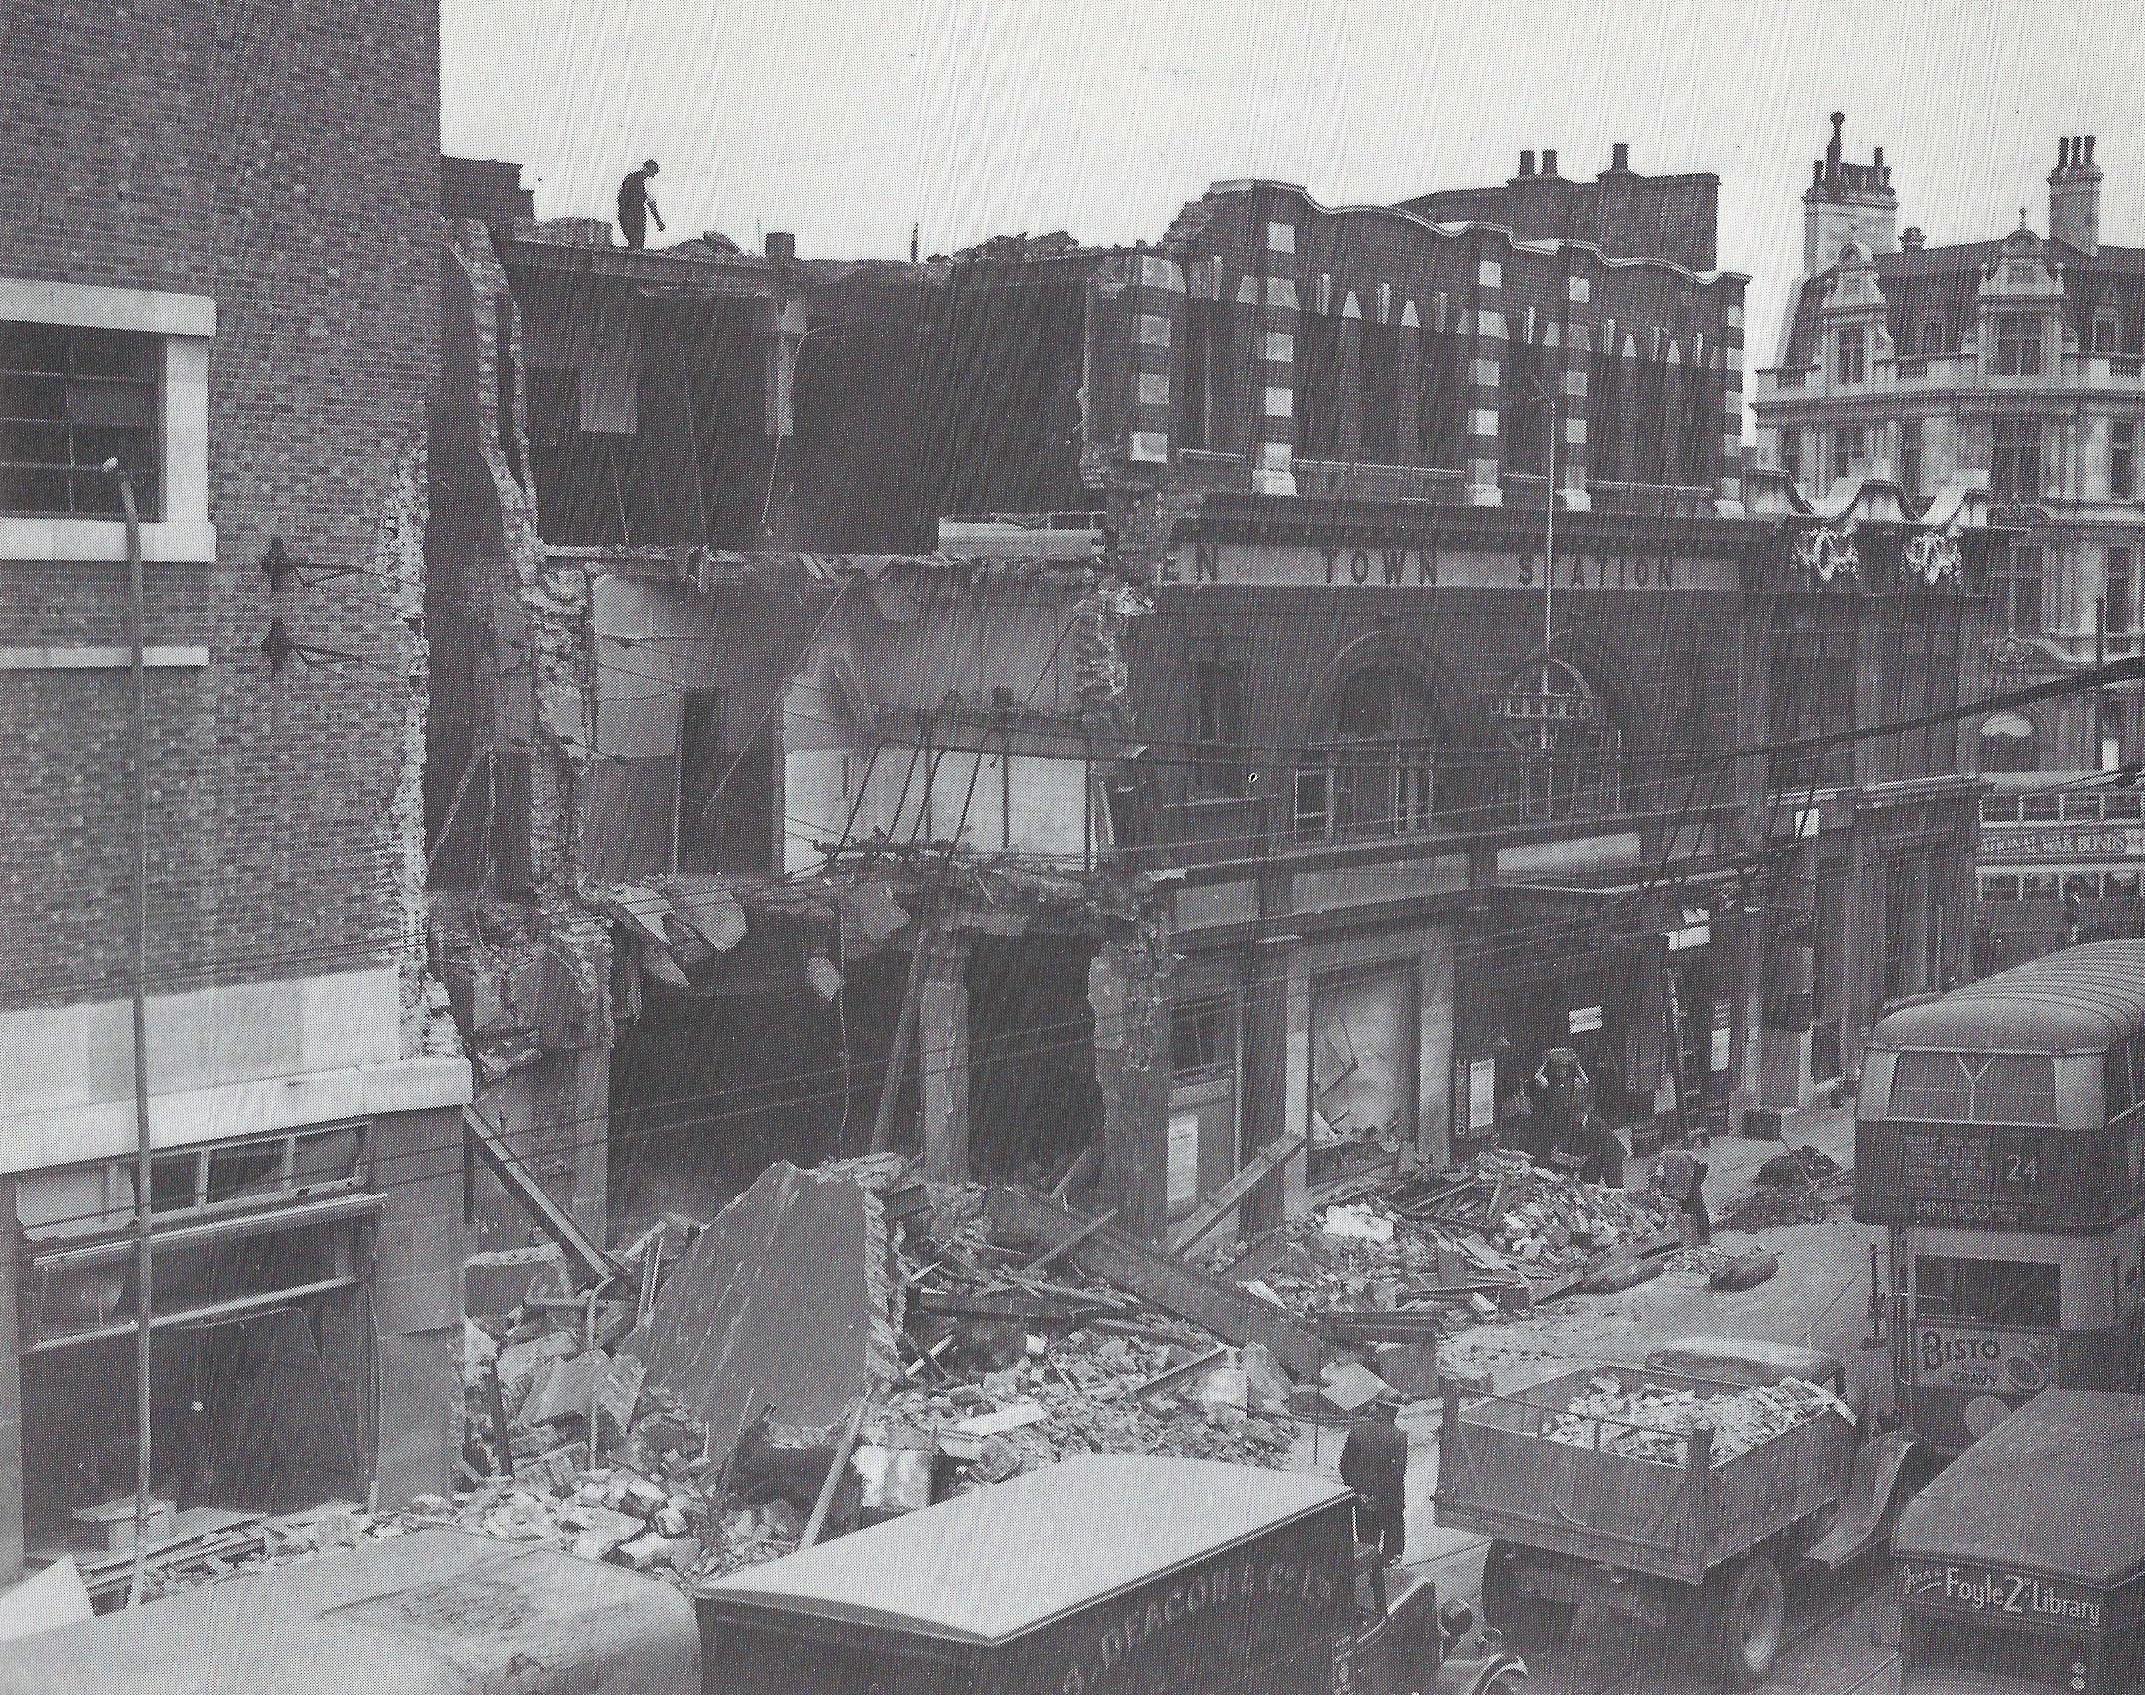 Camden Town tube station, damaged by a World War II bomb, from Camden at War